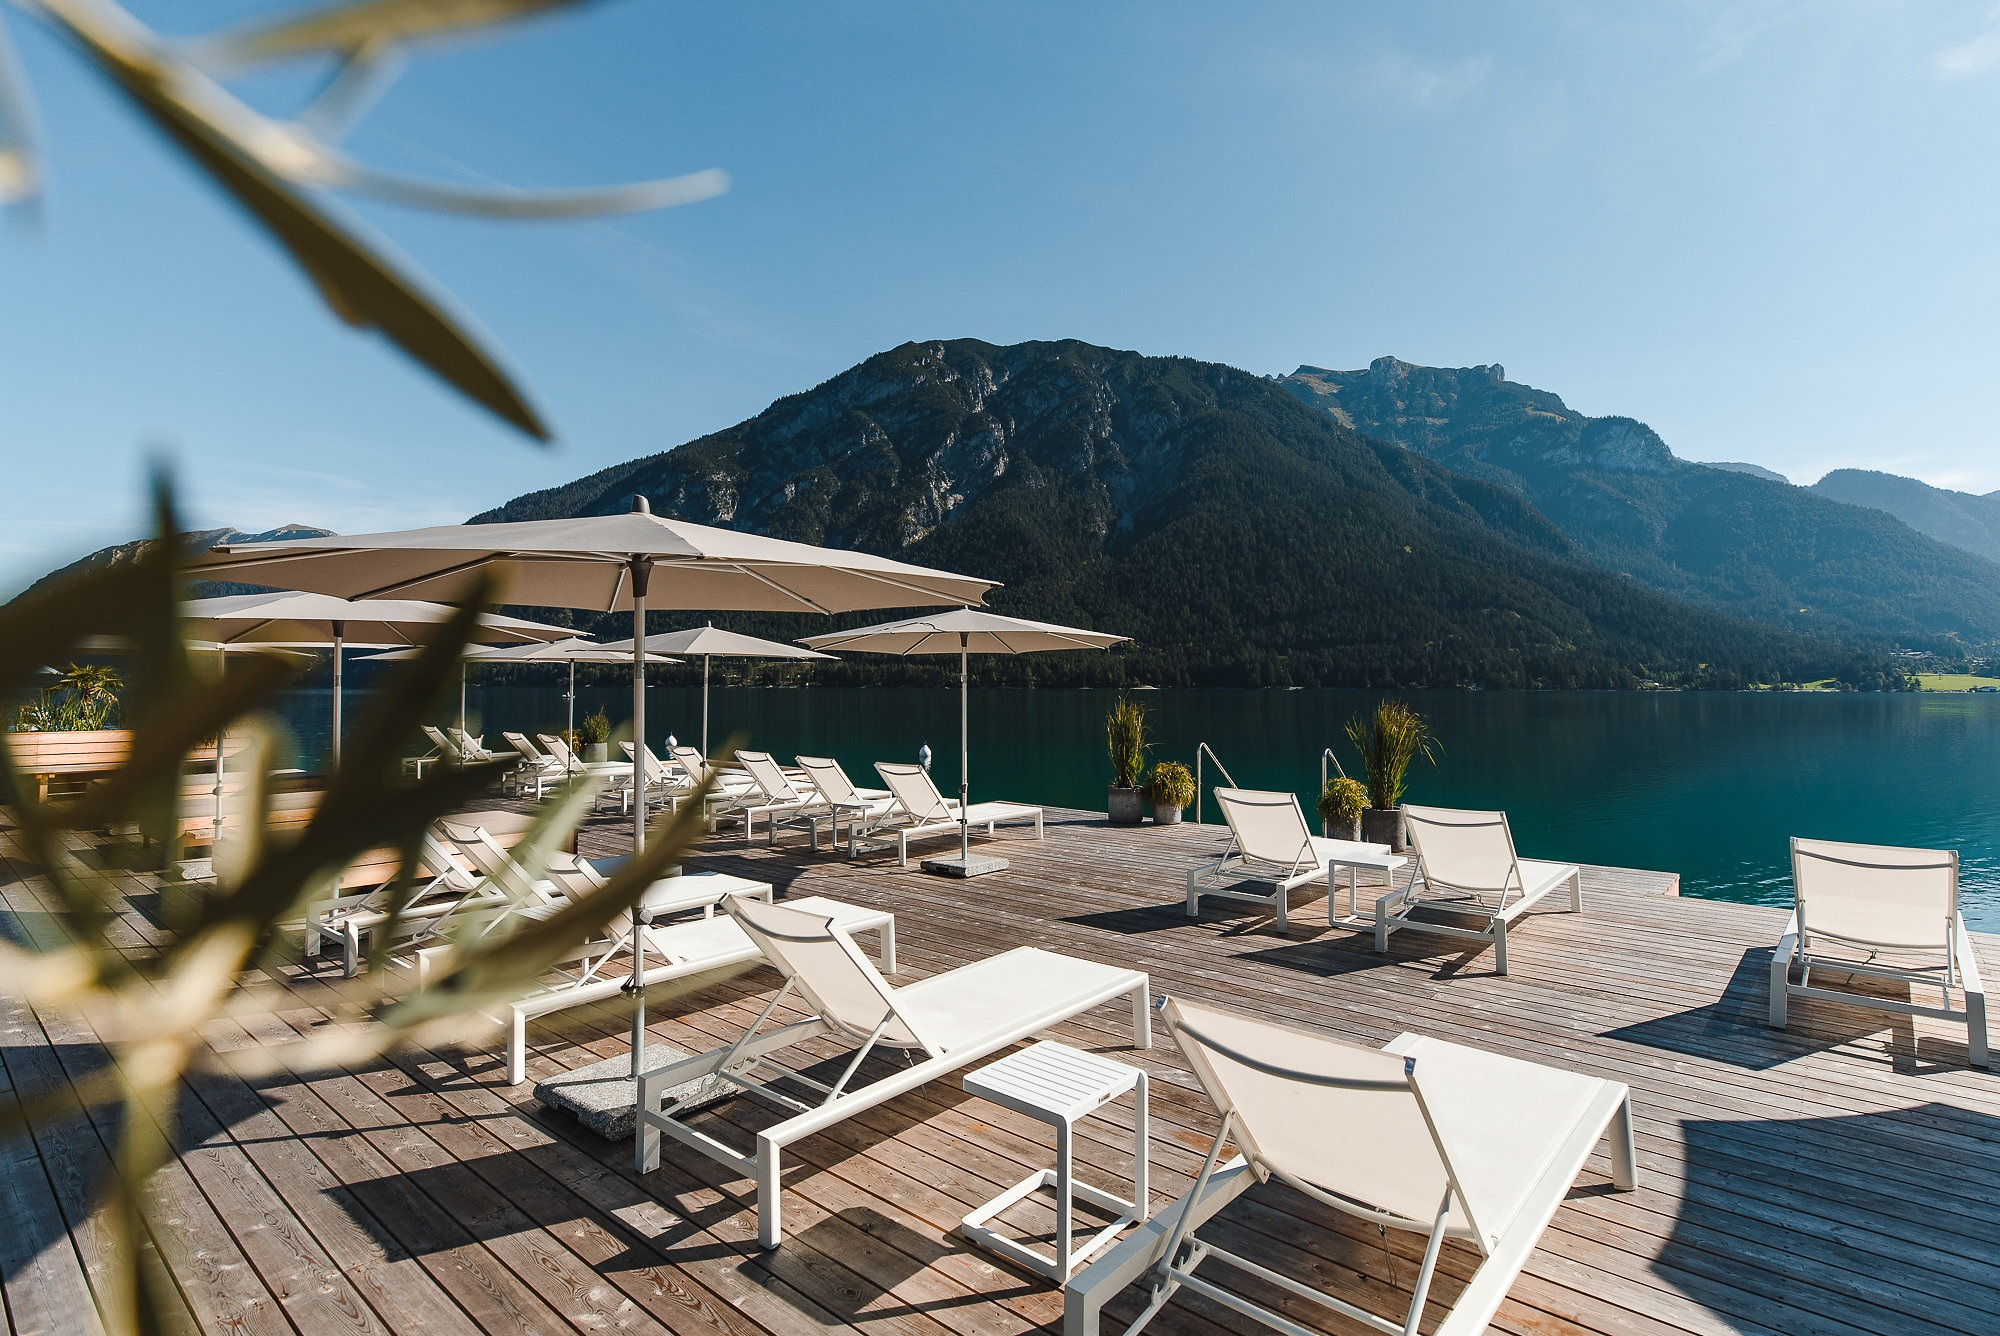 Hoteleigener Badesteg © Seehotel Einwaller